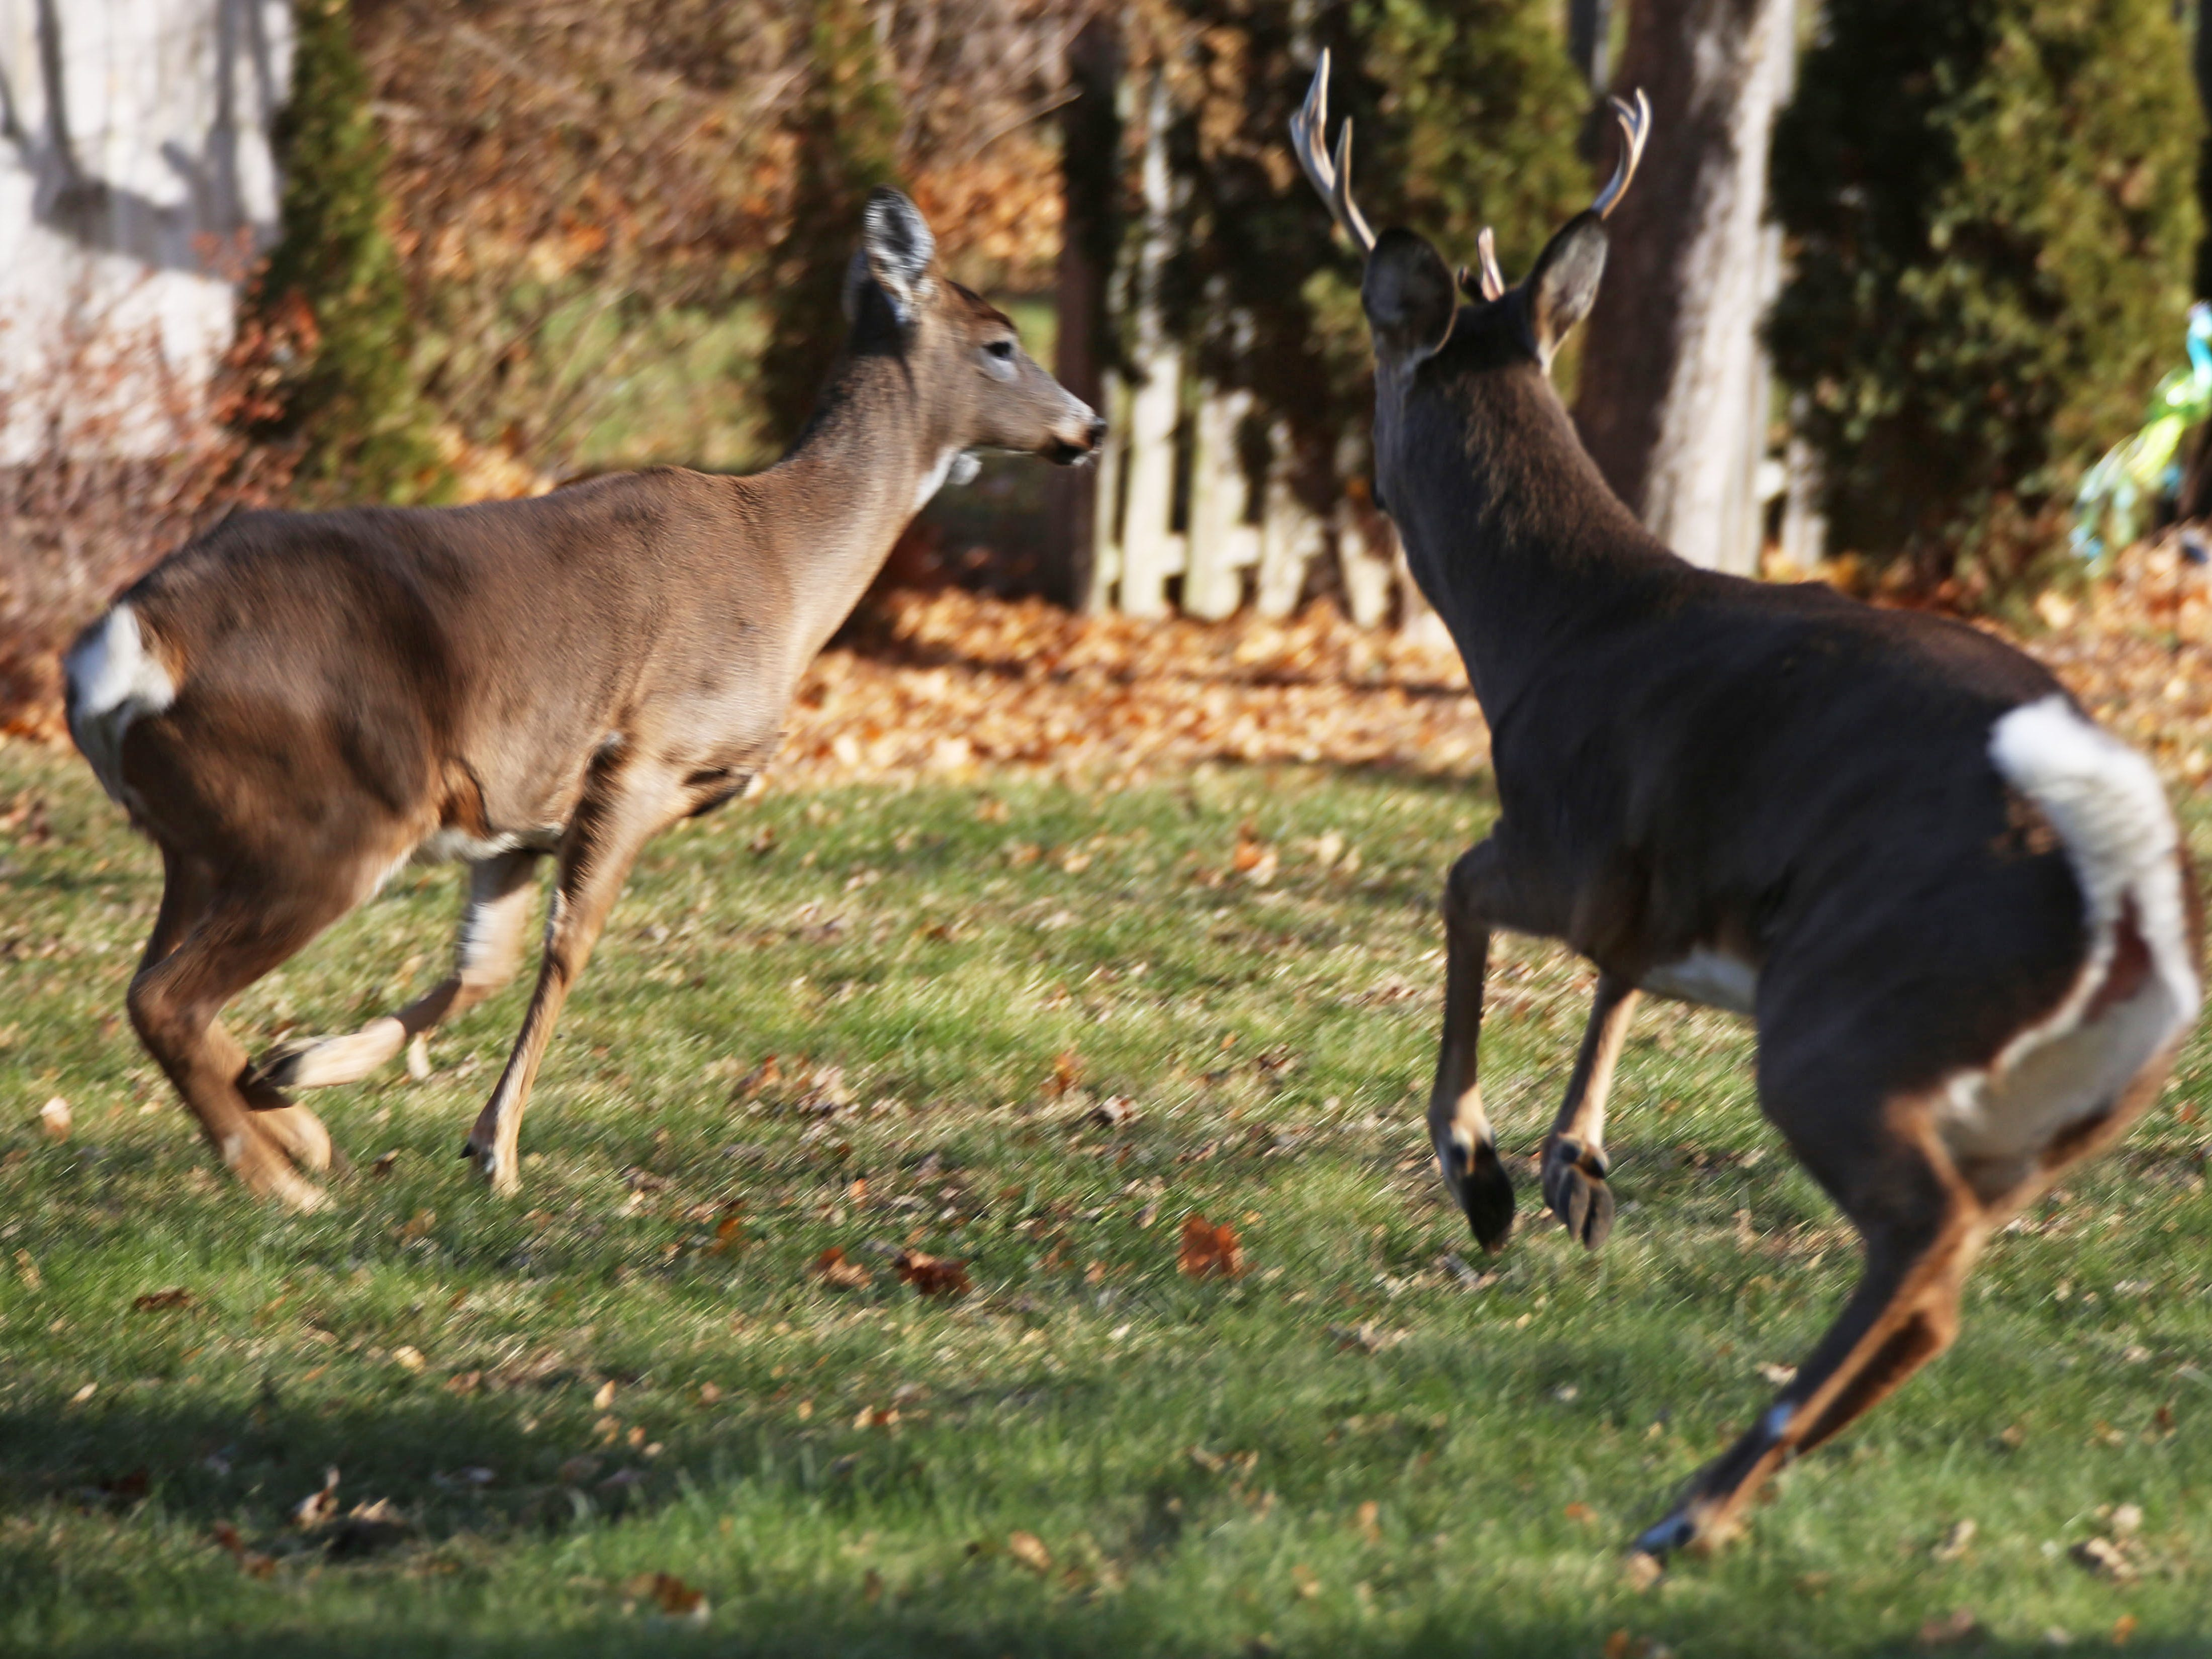 Deer prepare to leave backyards in the 1000 block of North 23rd Street in Sheboygan, Tuesday, November 27, 2018 in Sheboygan, Wis.